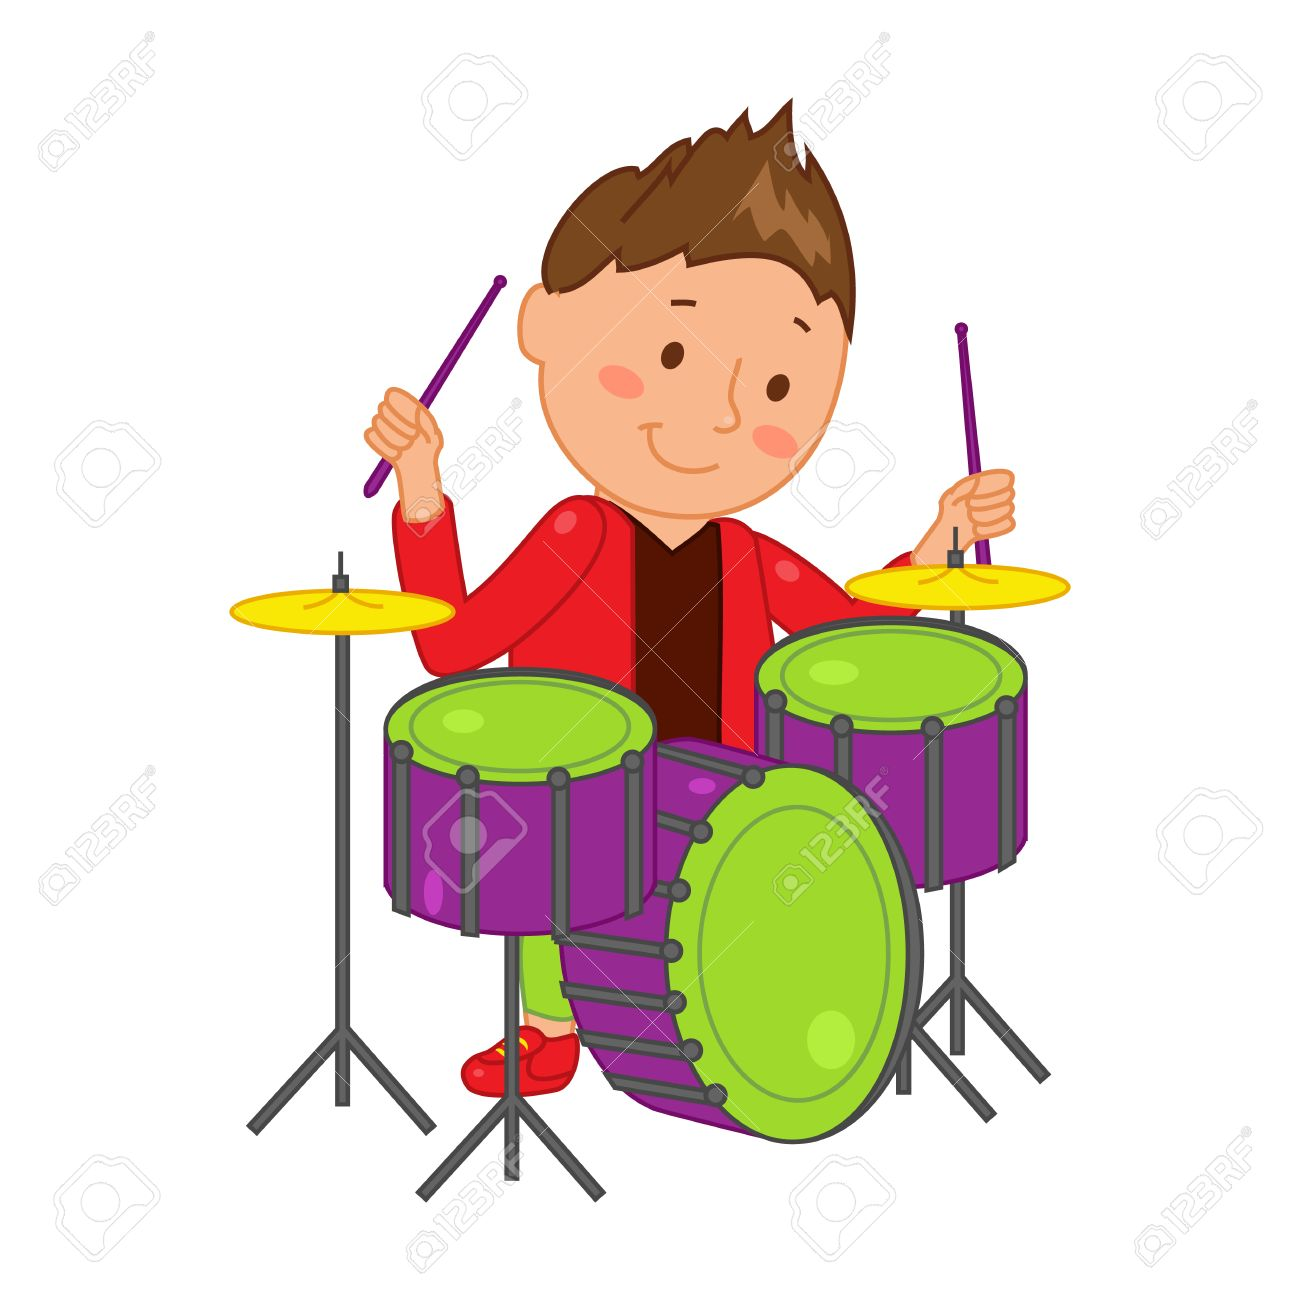 Cartoon musician kid. Vector illustration for children music.